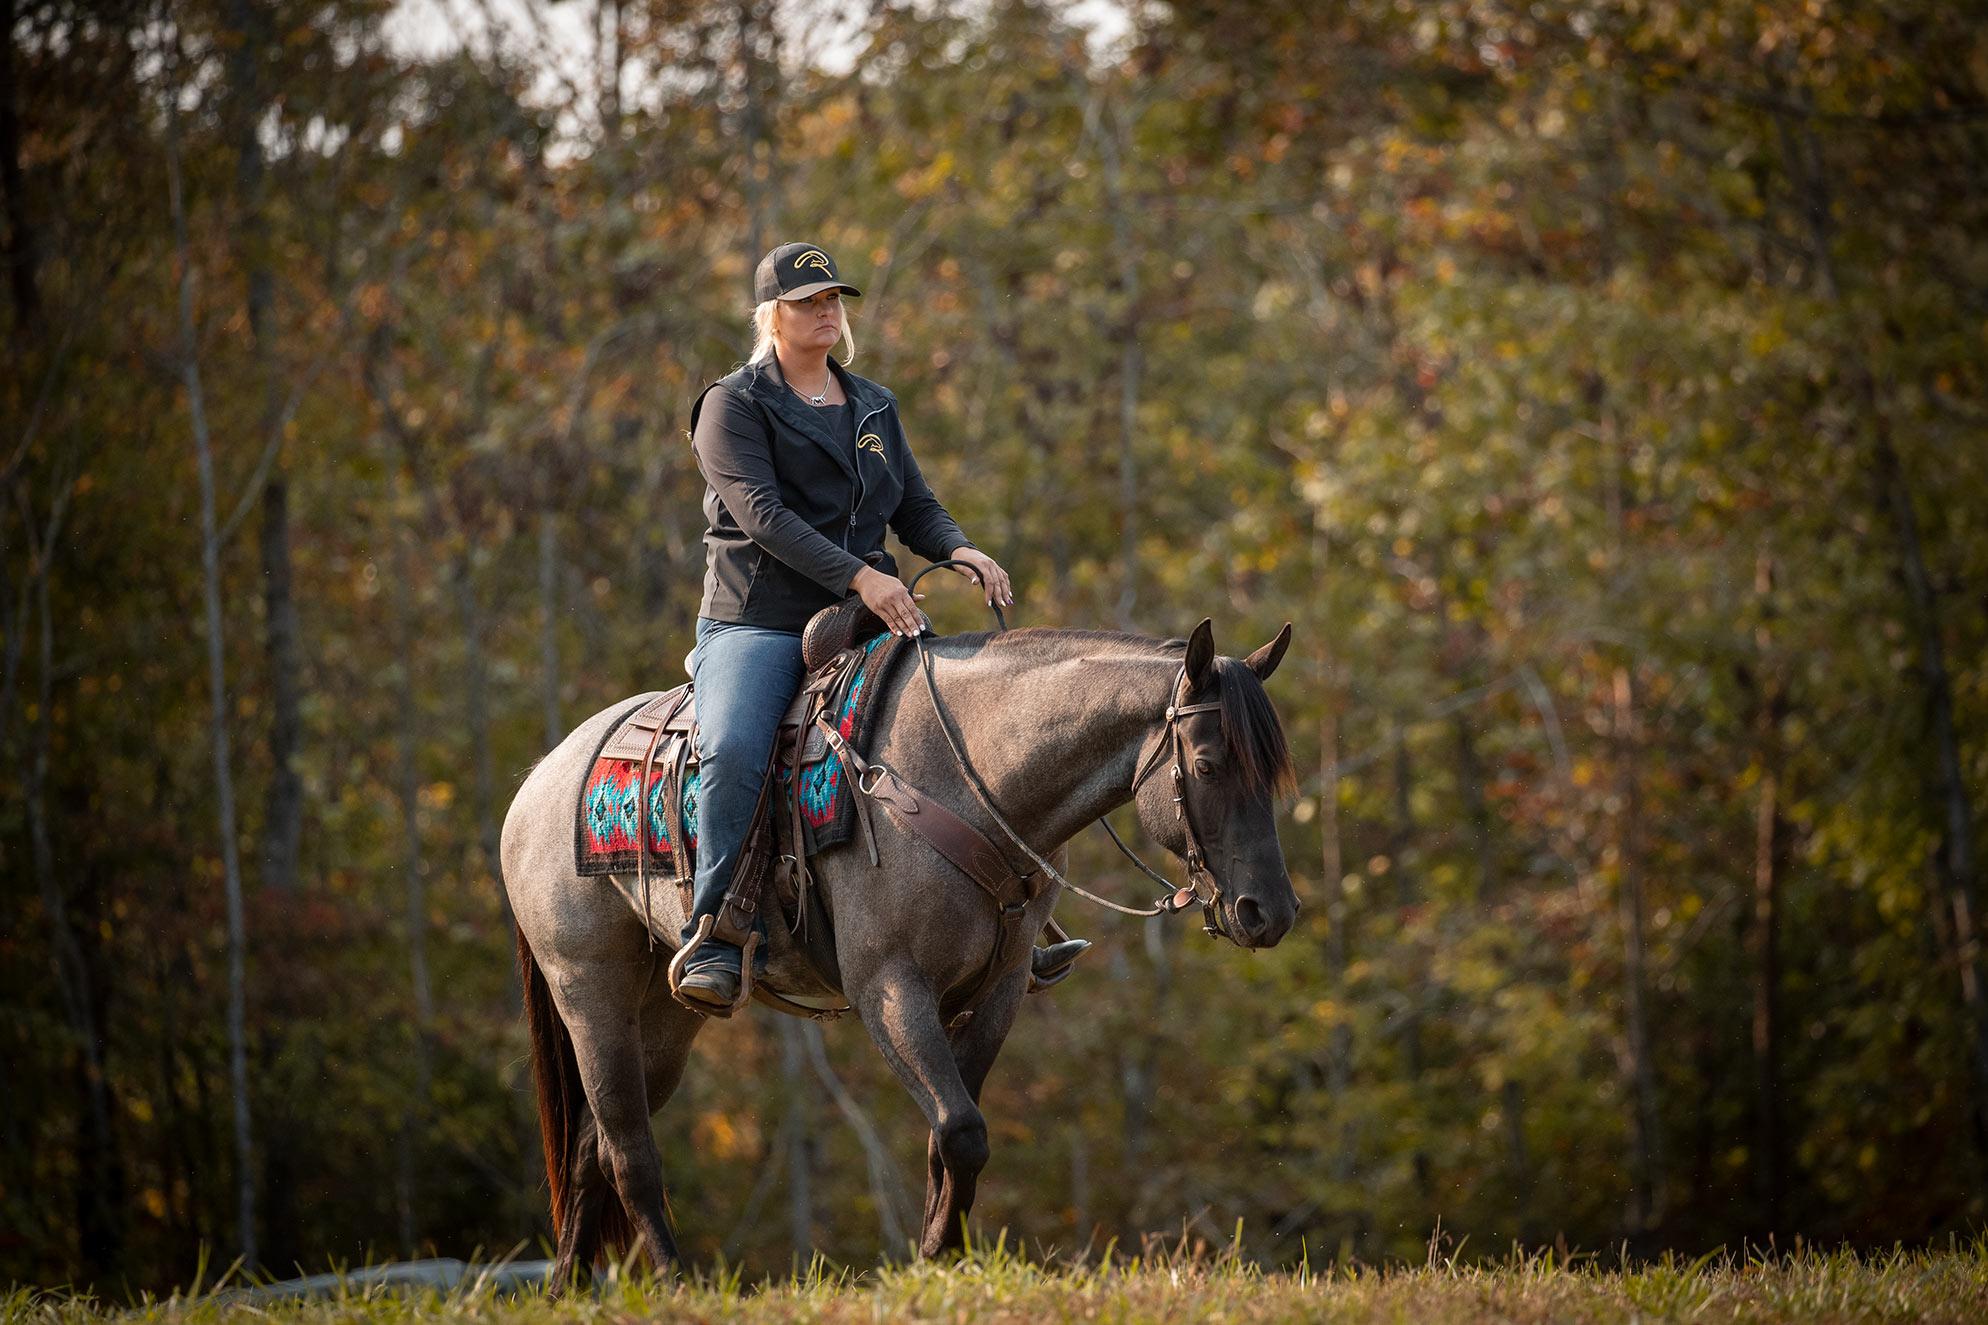 009-Gunsmoke-Luxury-Trail-Horse-For-Sale